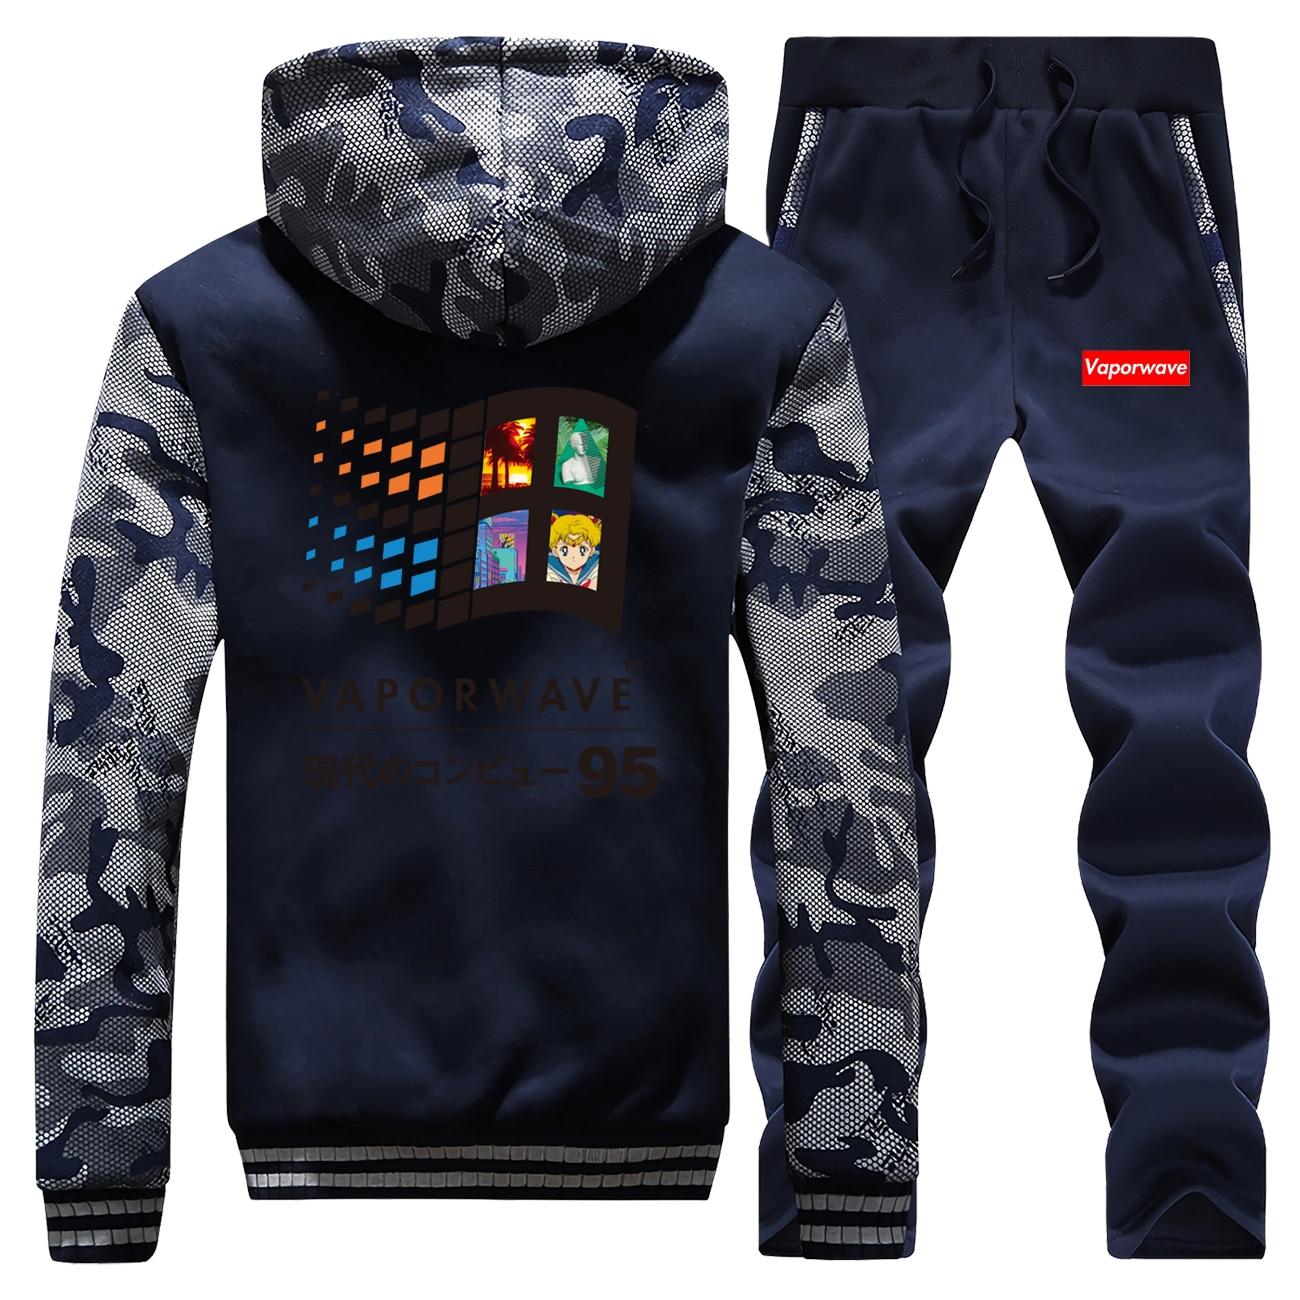 Vaporwave Hoodies Pants Set Men Japanese Anime Aesthetic 80s Tracksuit Coat Track Suit Winter Thicken Fleece Jacket 2 Piece Sets